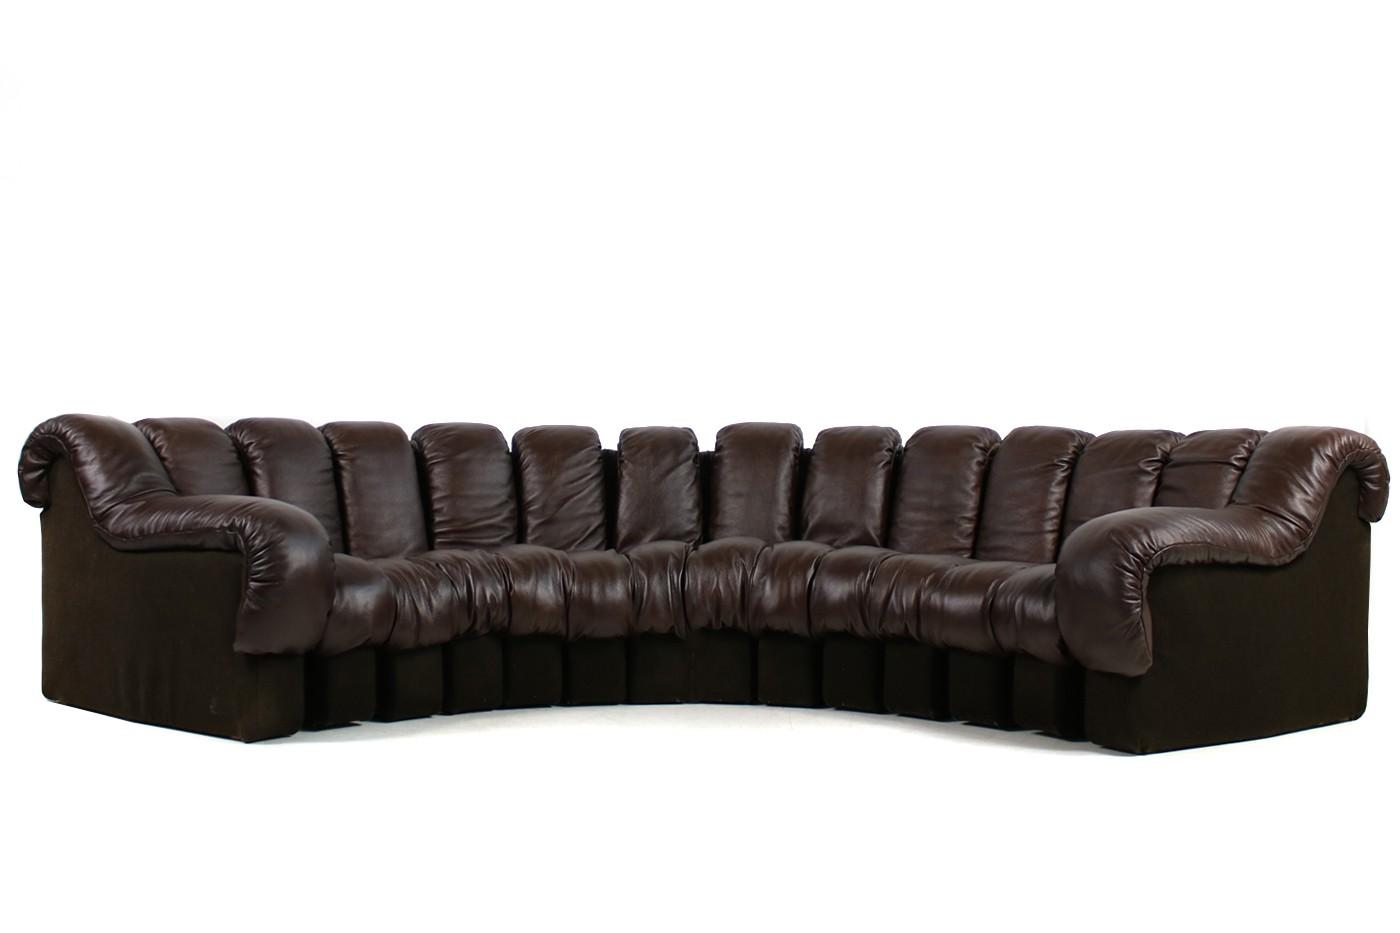 sold 1970s de sede ds 600 lounge leather sofa ueli berger. Black Bedroom Furniture Sets. Home Design Ideas